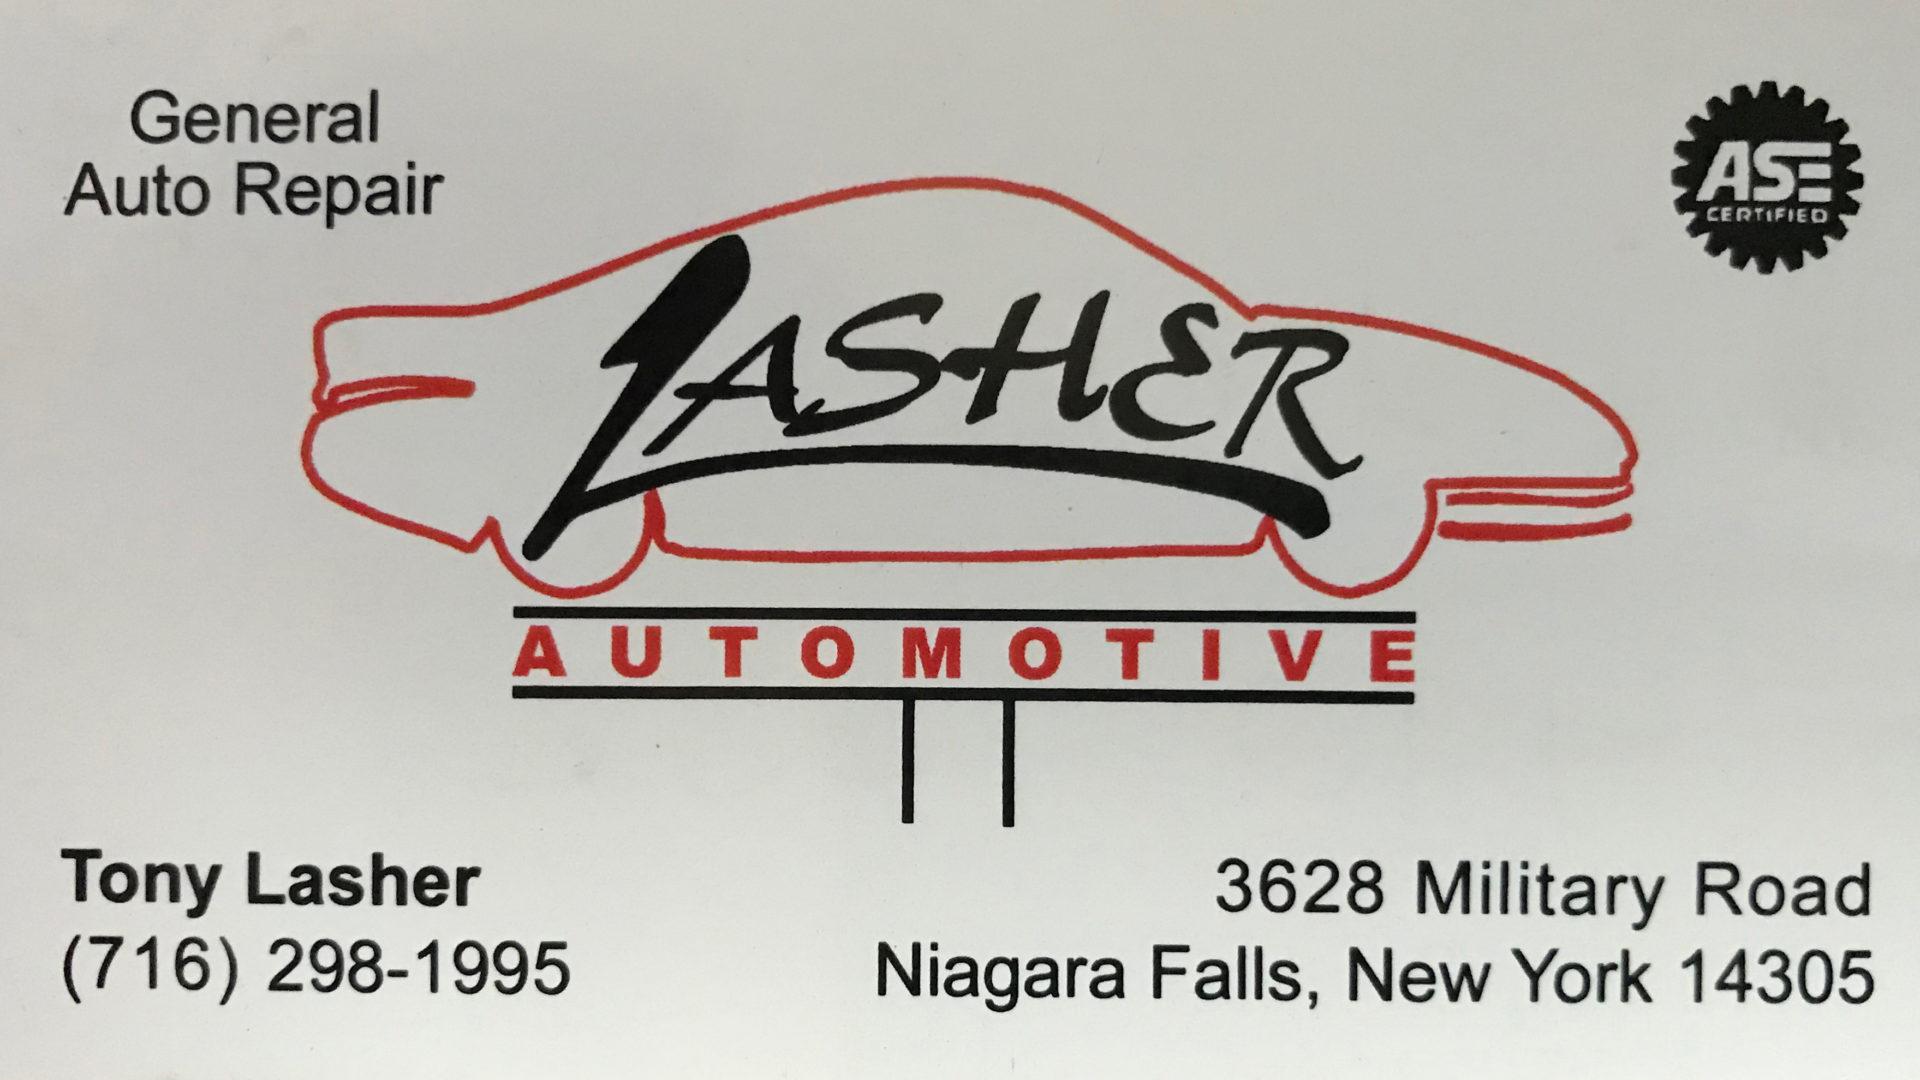 Lasher Automotive Repair Shop Niagara Falls, NY – Complete